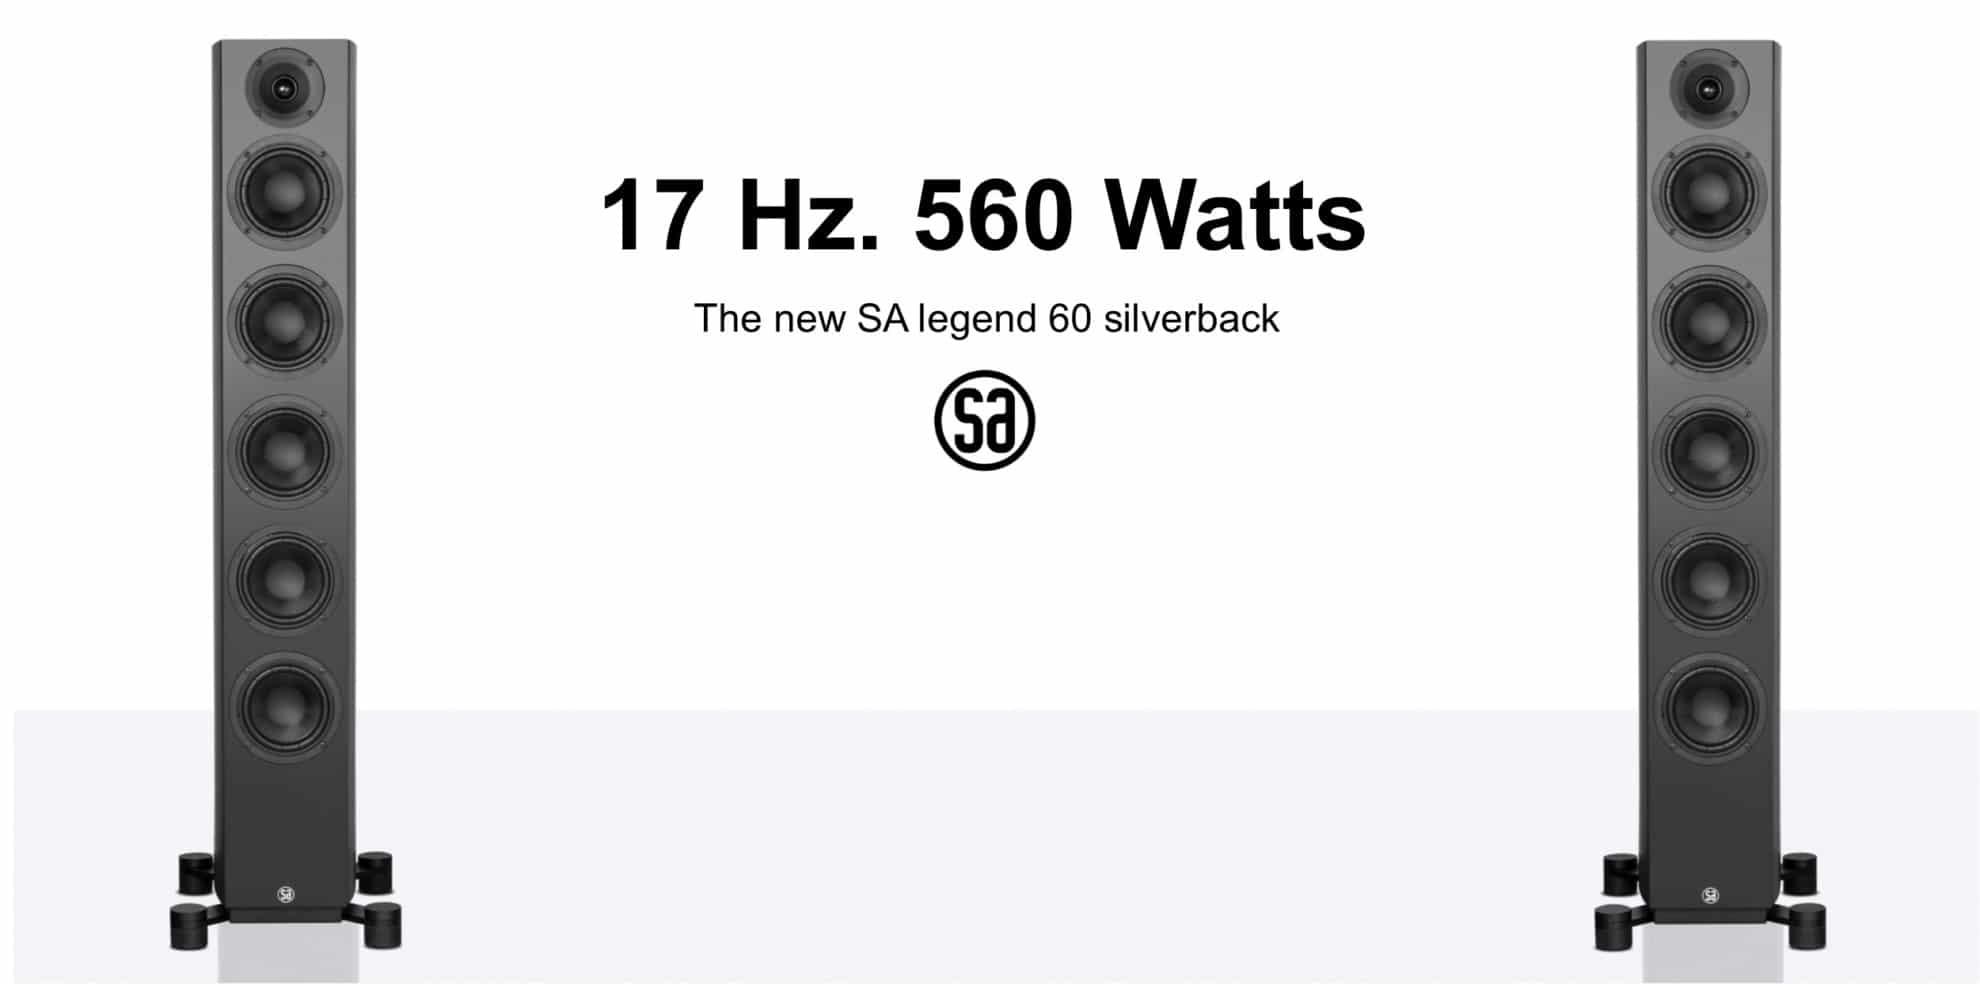 17 Hz